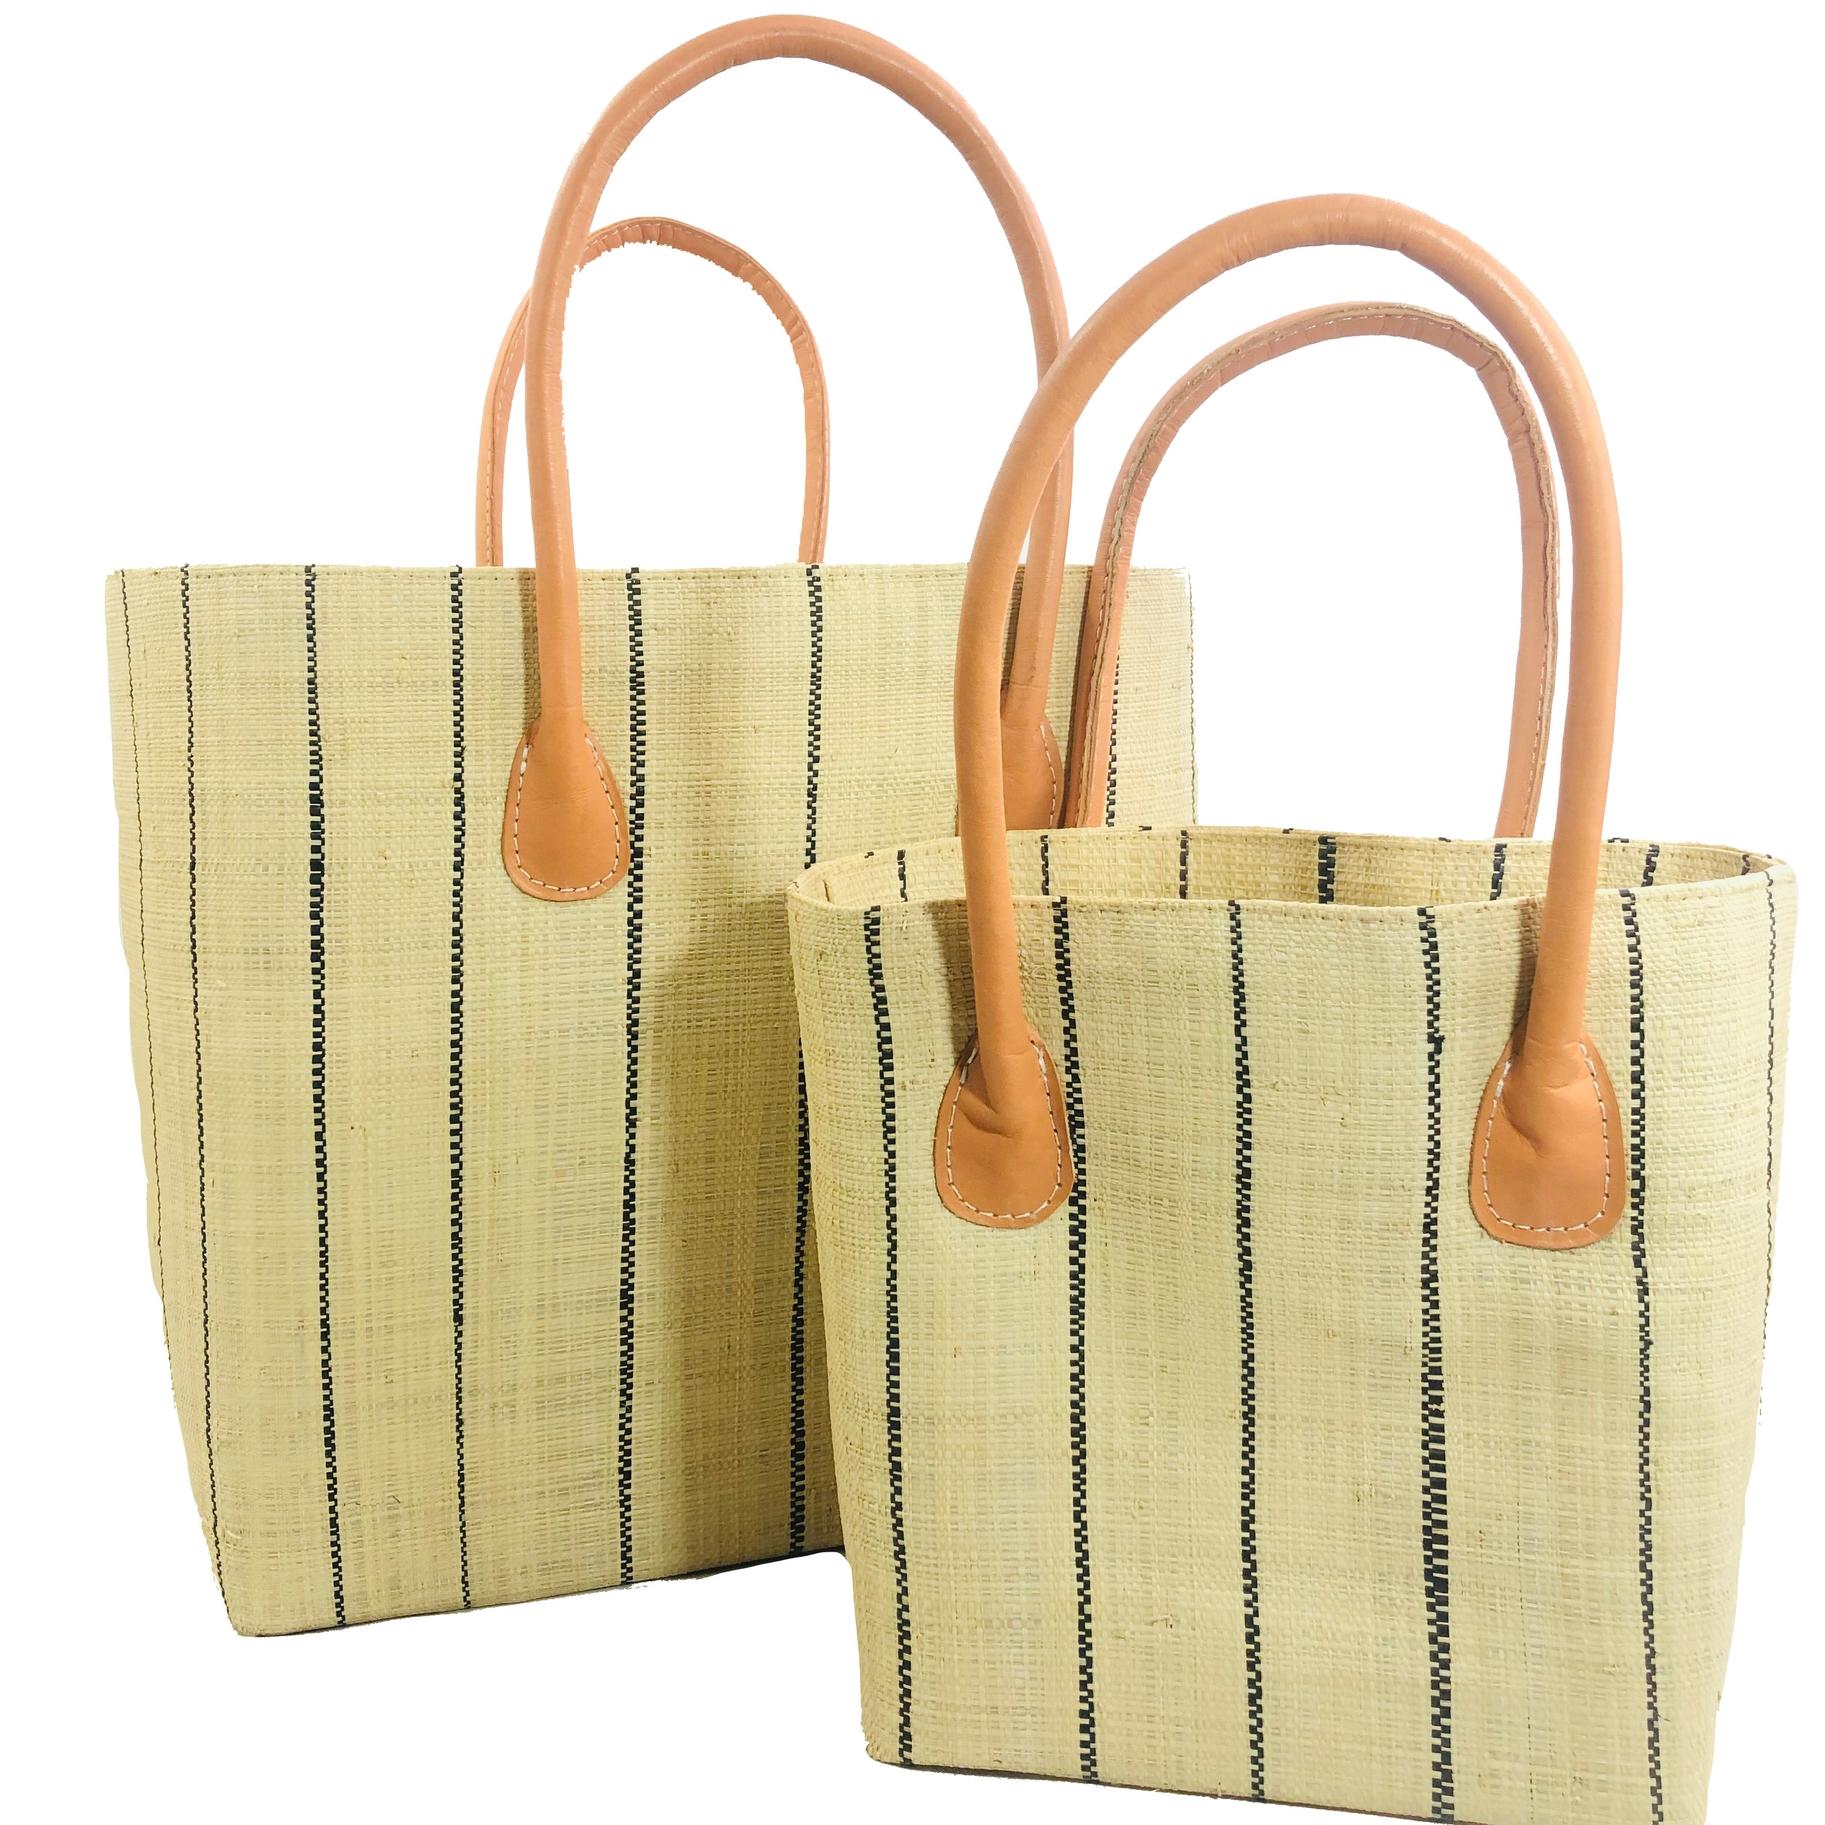 Soubic Pin Stripes Basket - Natural | Trada Marketplace